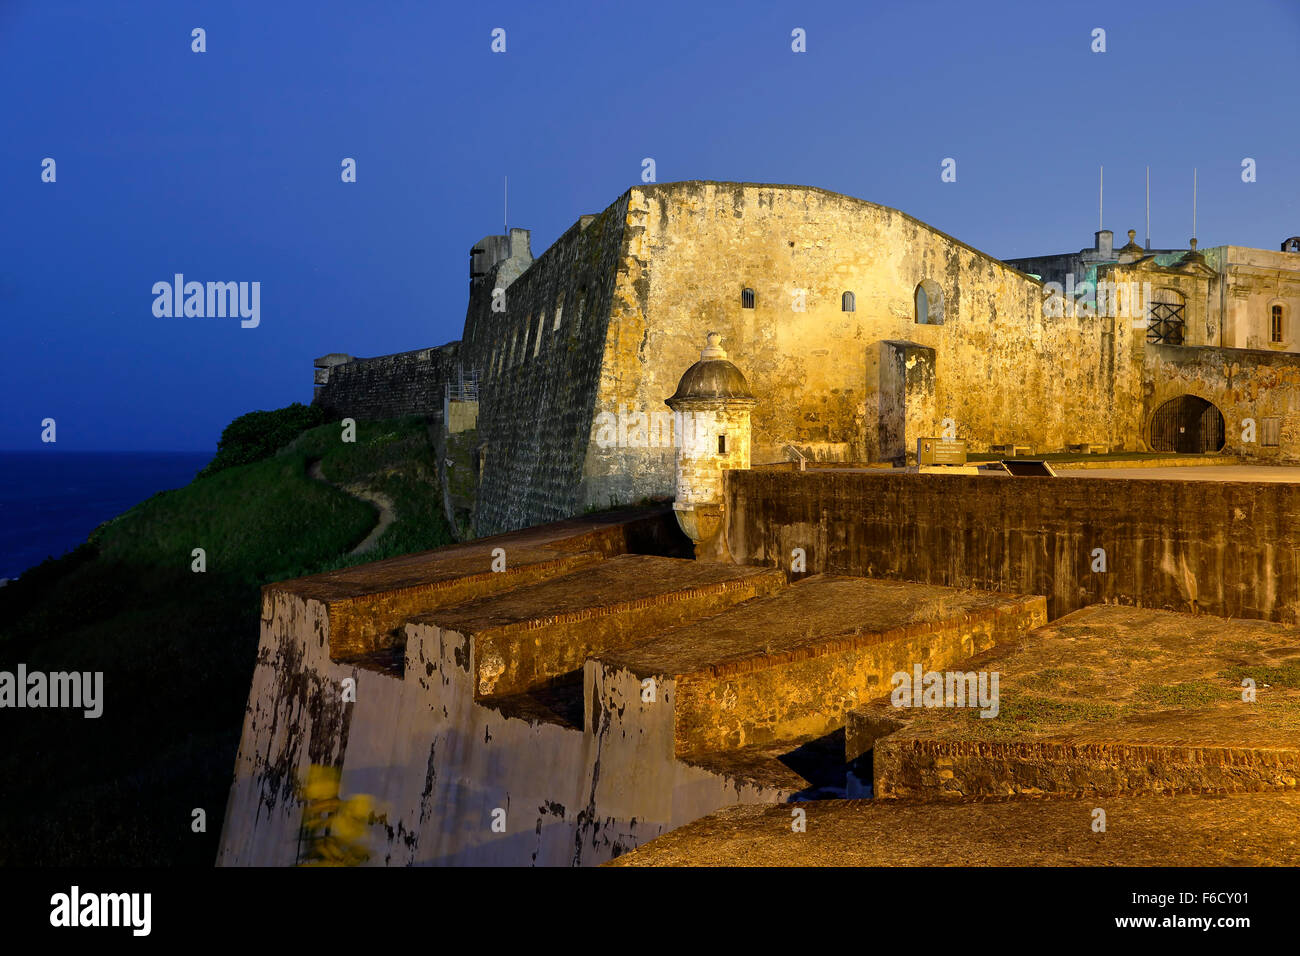 Die Burg San Cristóbal, San Juan National Historic Site, Old San Juan, Puerto Rico Stockbild